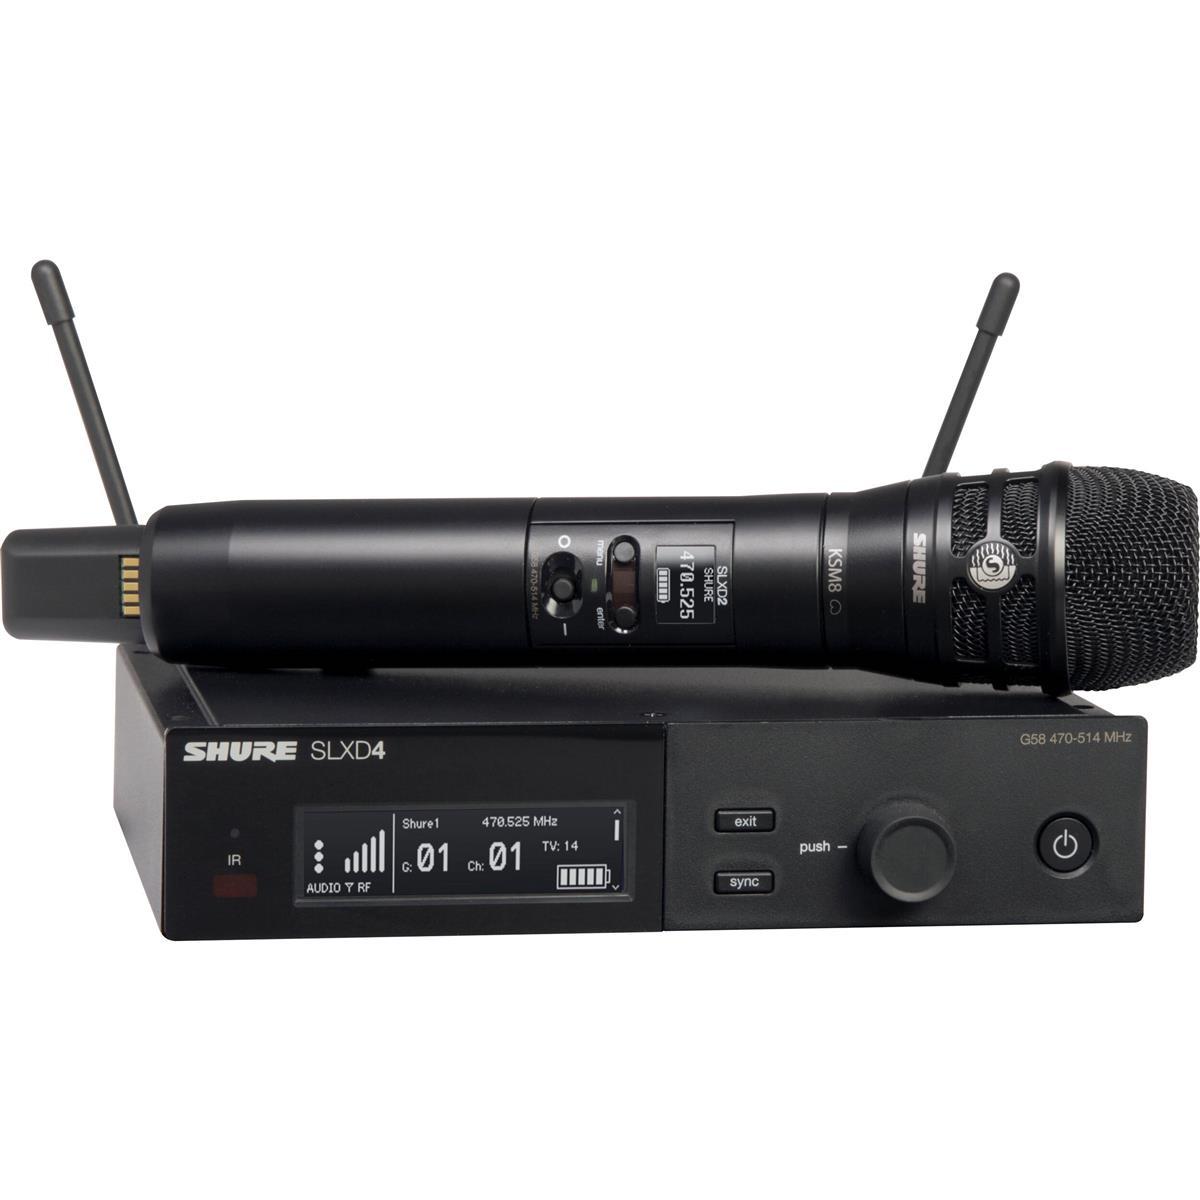 Shure SLX-D Handheld System KSM8B Microphone - 518-562MHz